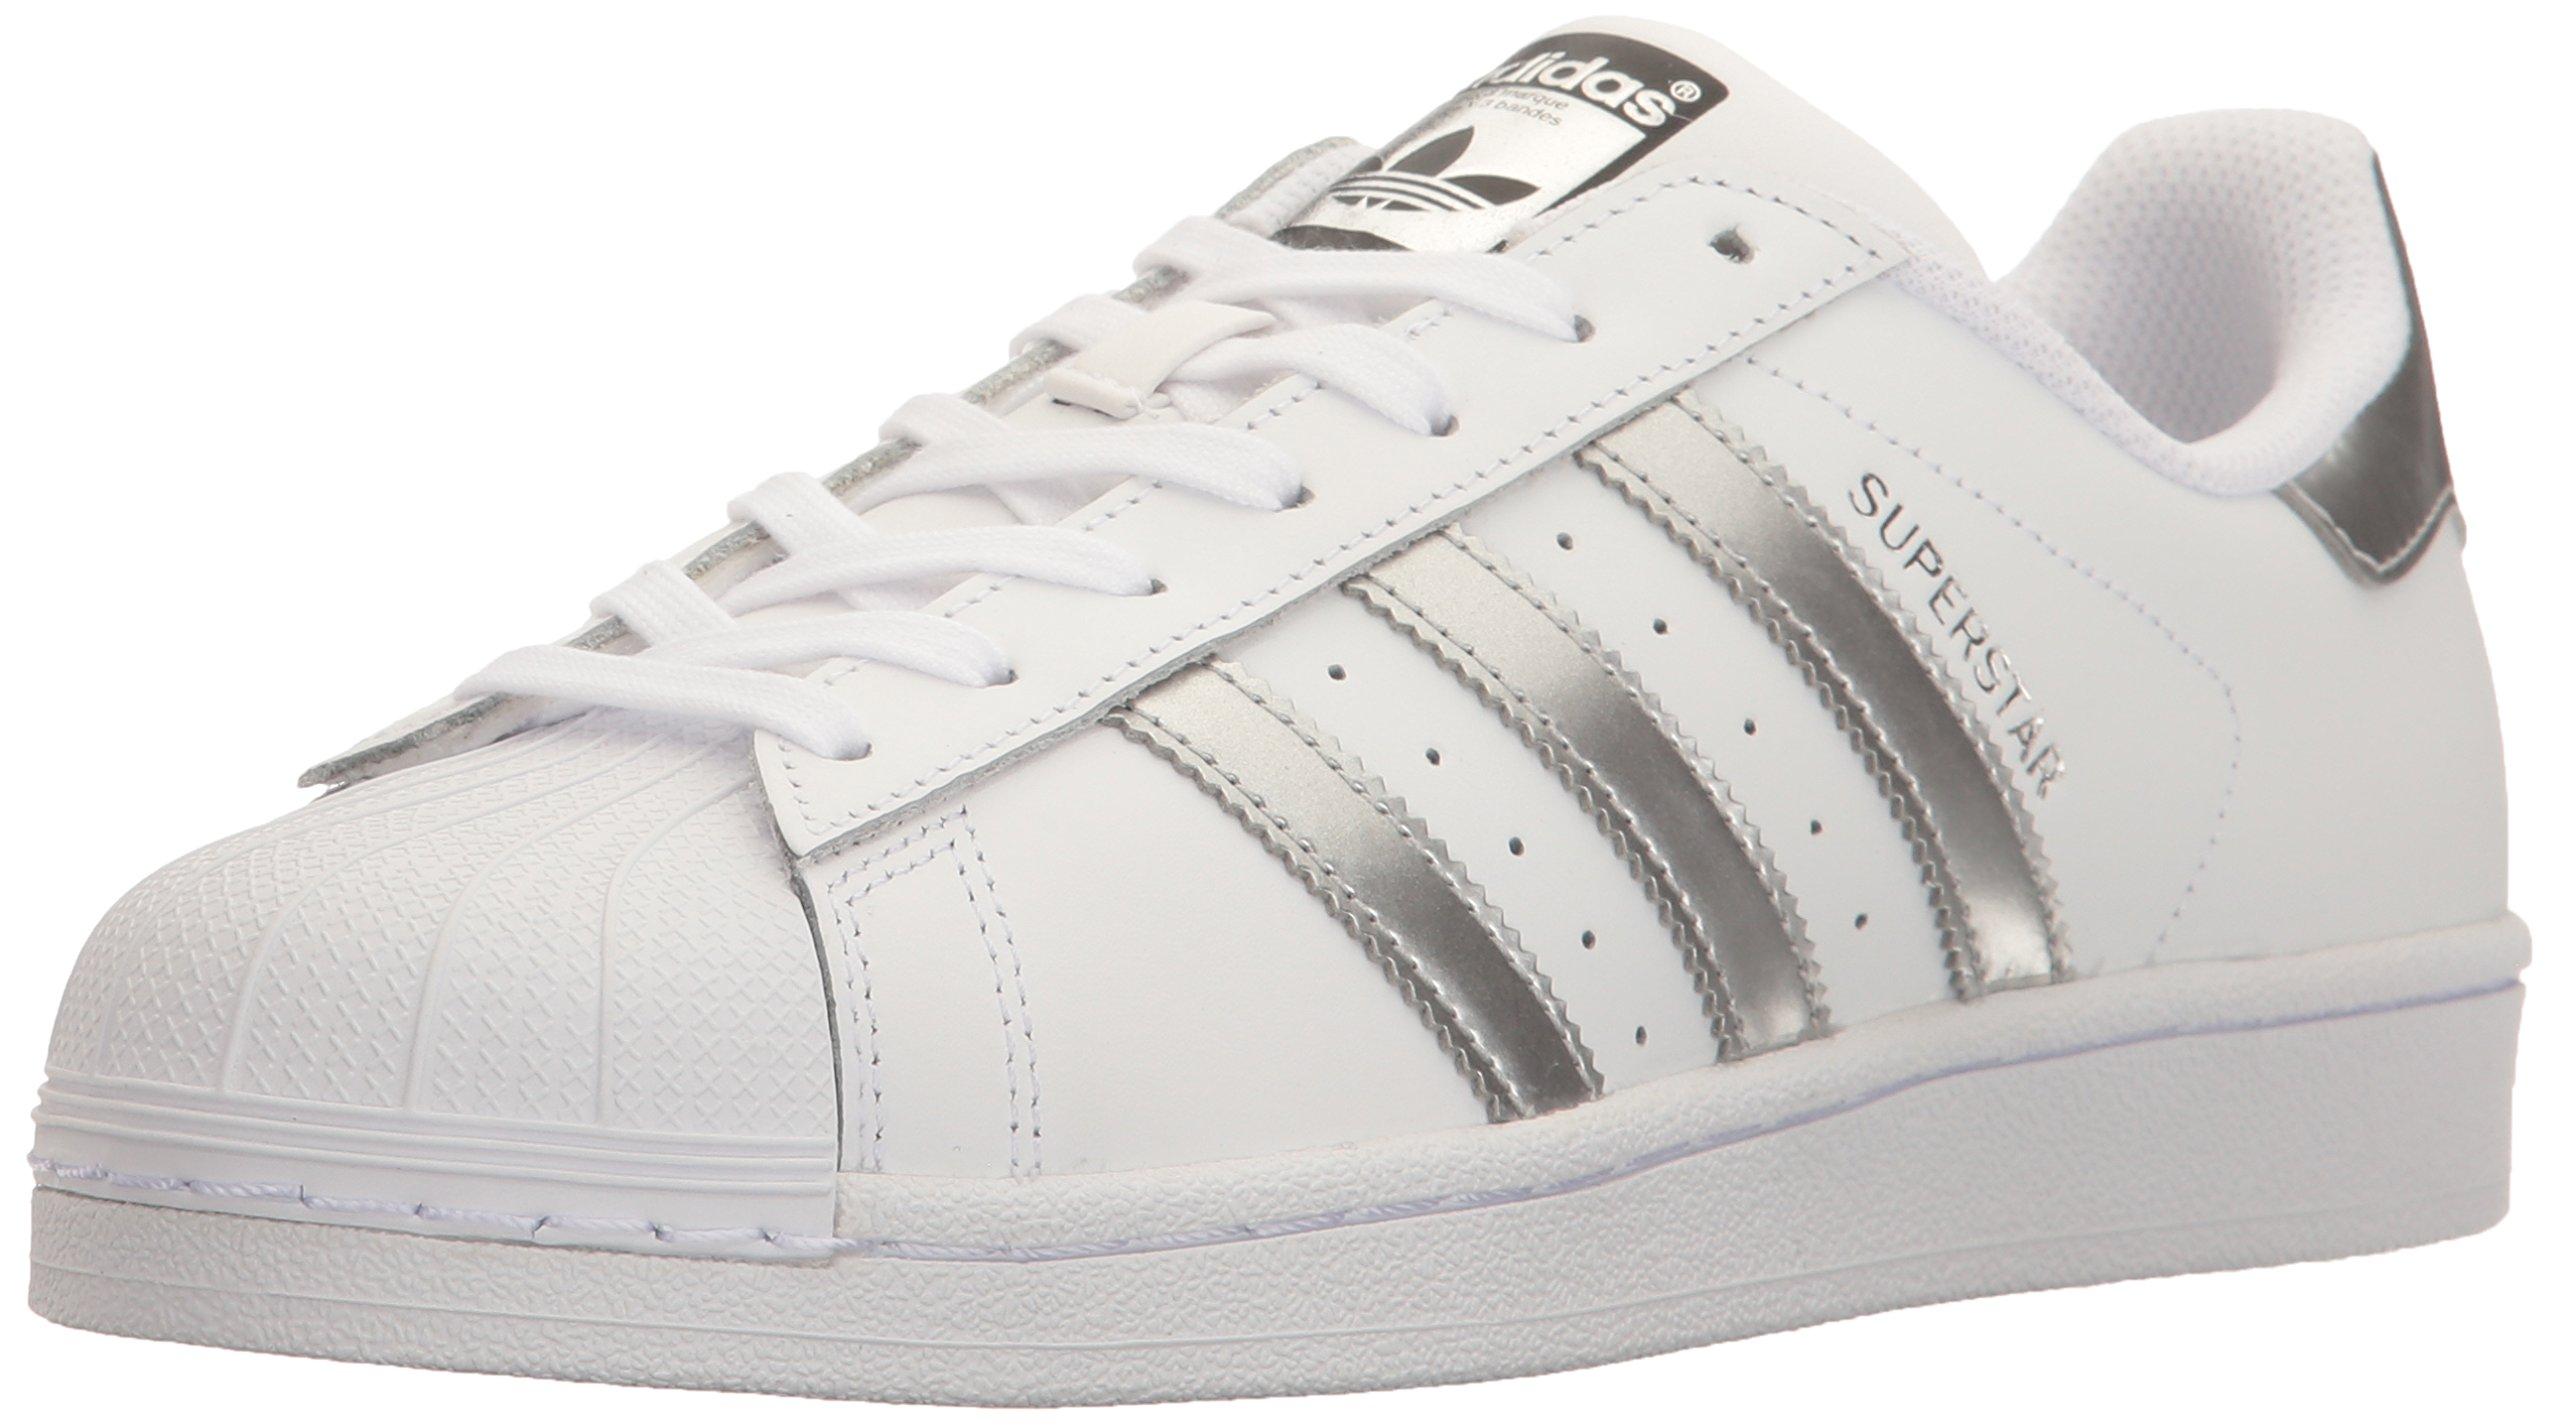 adidas Originals Women's Superstar Fashion Sneaker, White/Silver Metallic/Black,8.5 B(M) US